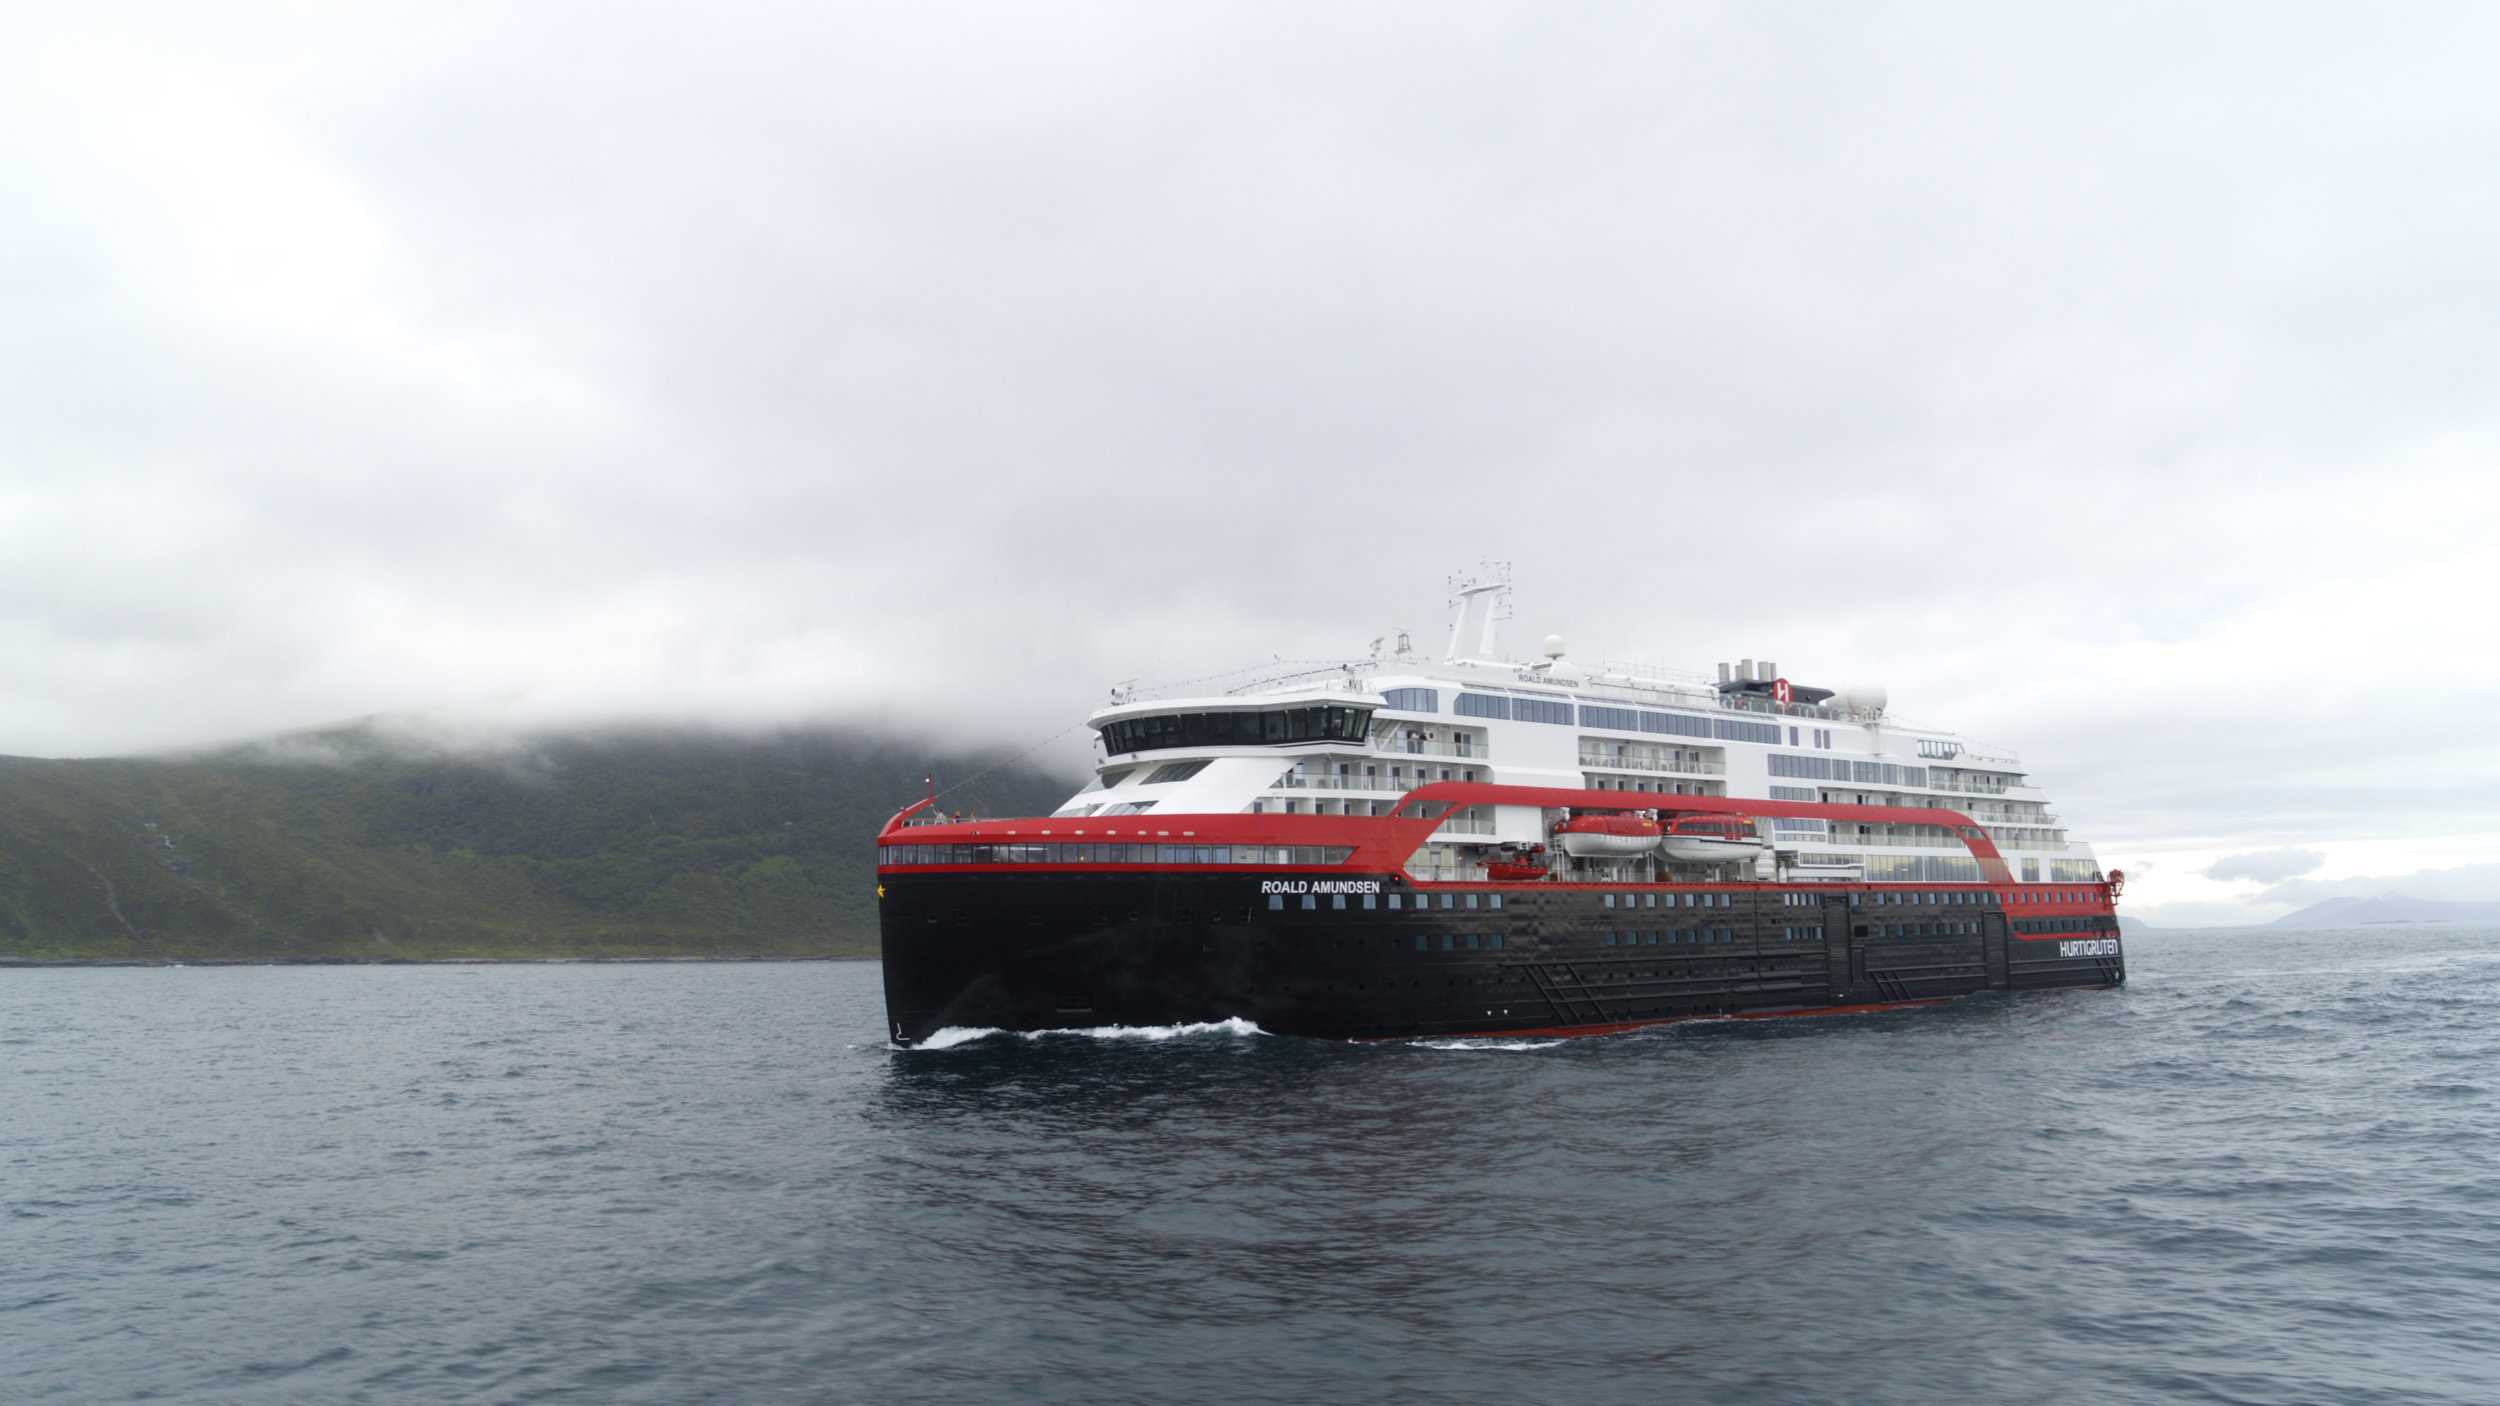 Hurtigruten MS Roald Amundsen 005 - hybrid powered - photo Hurtigruten.jpg